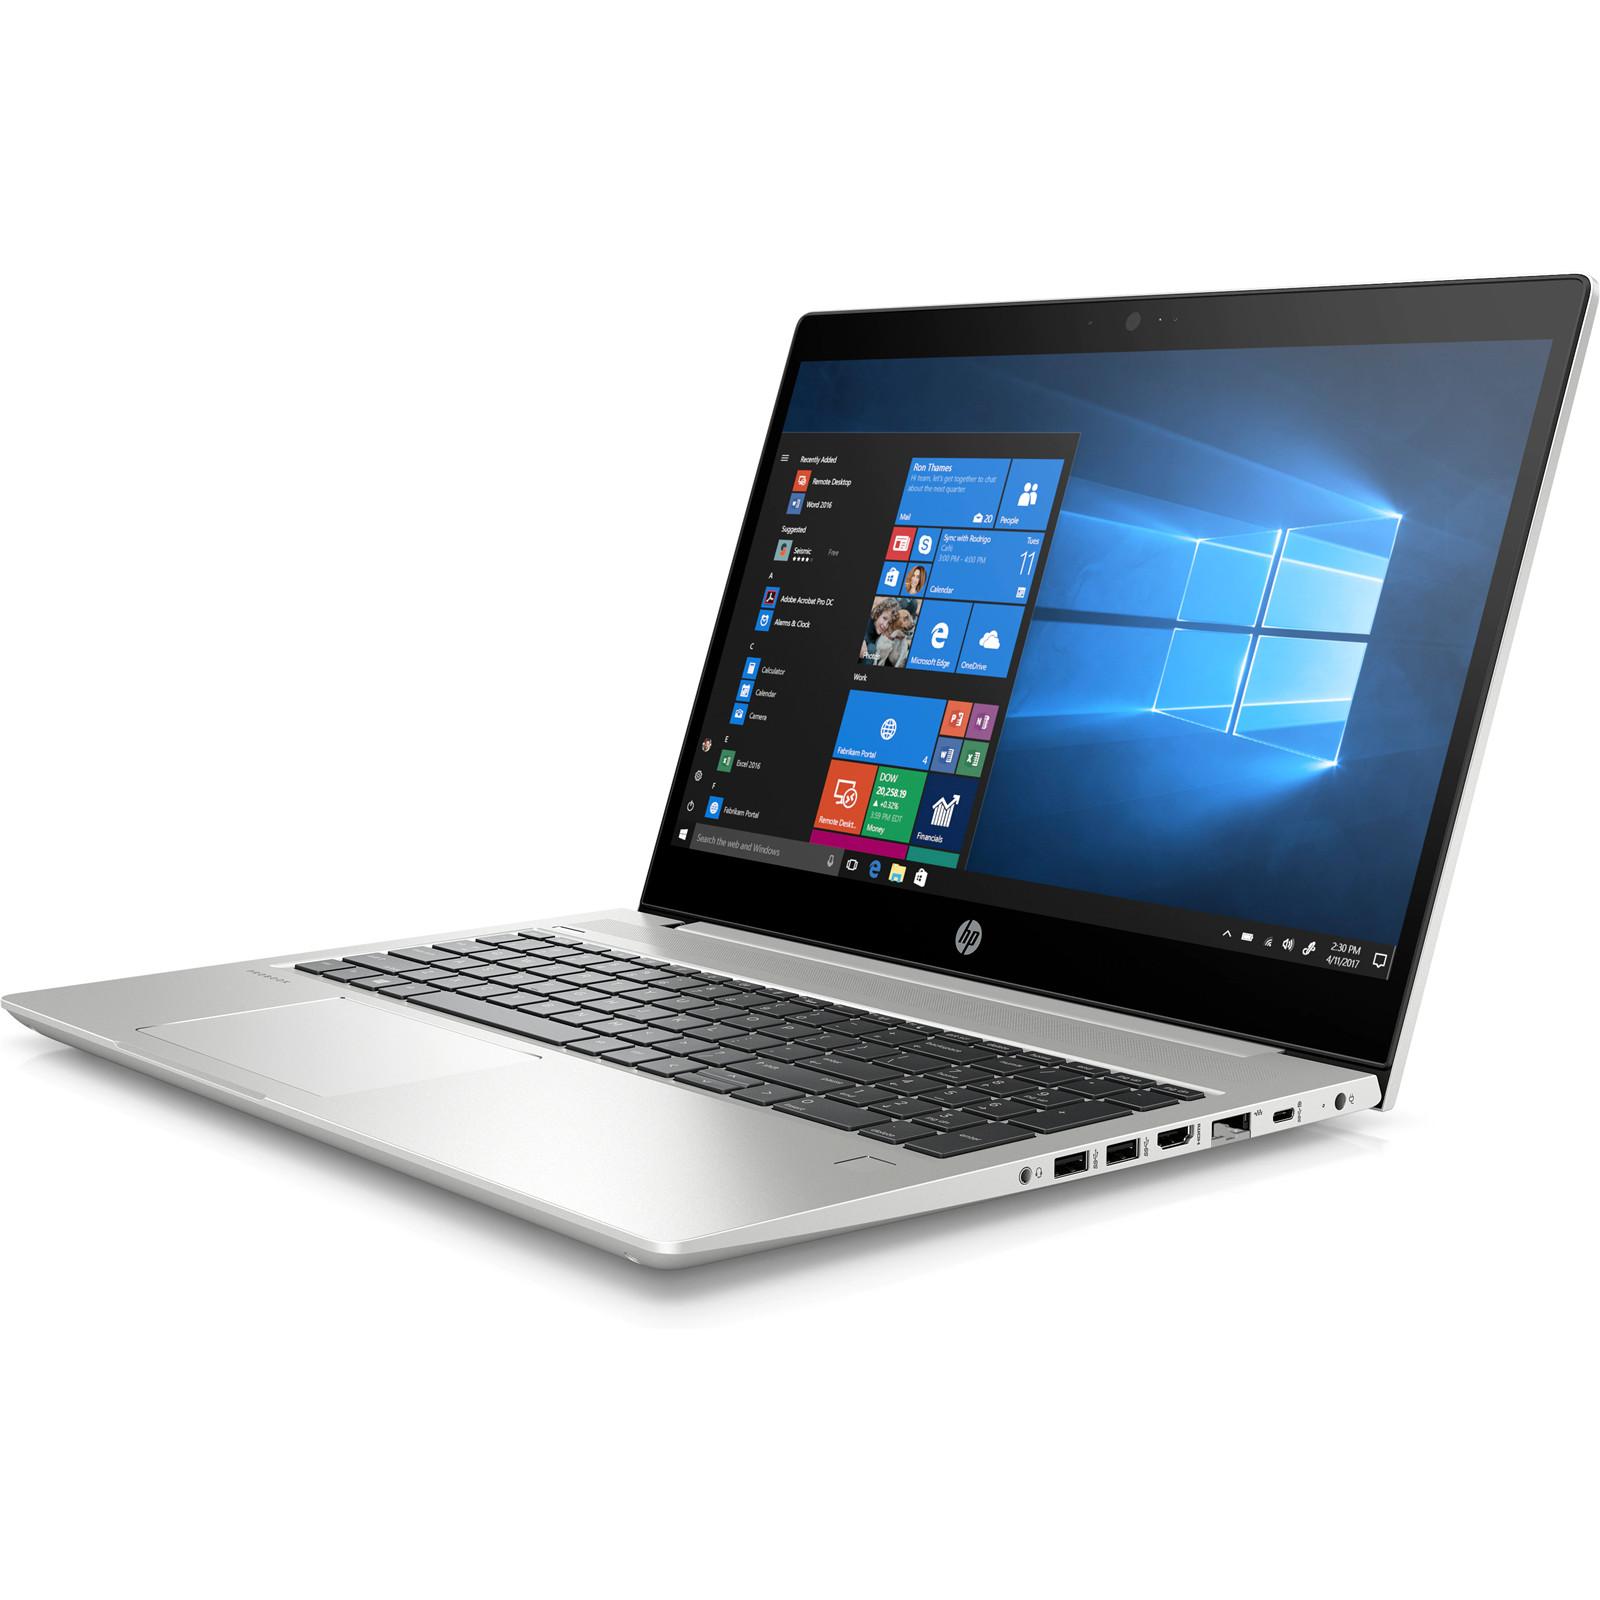 e669212ed638 Buy the HP Probook 450 G6 Business Laptop 15.6